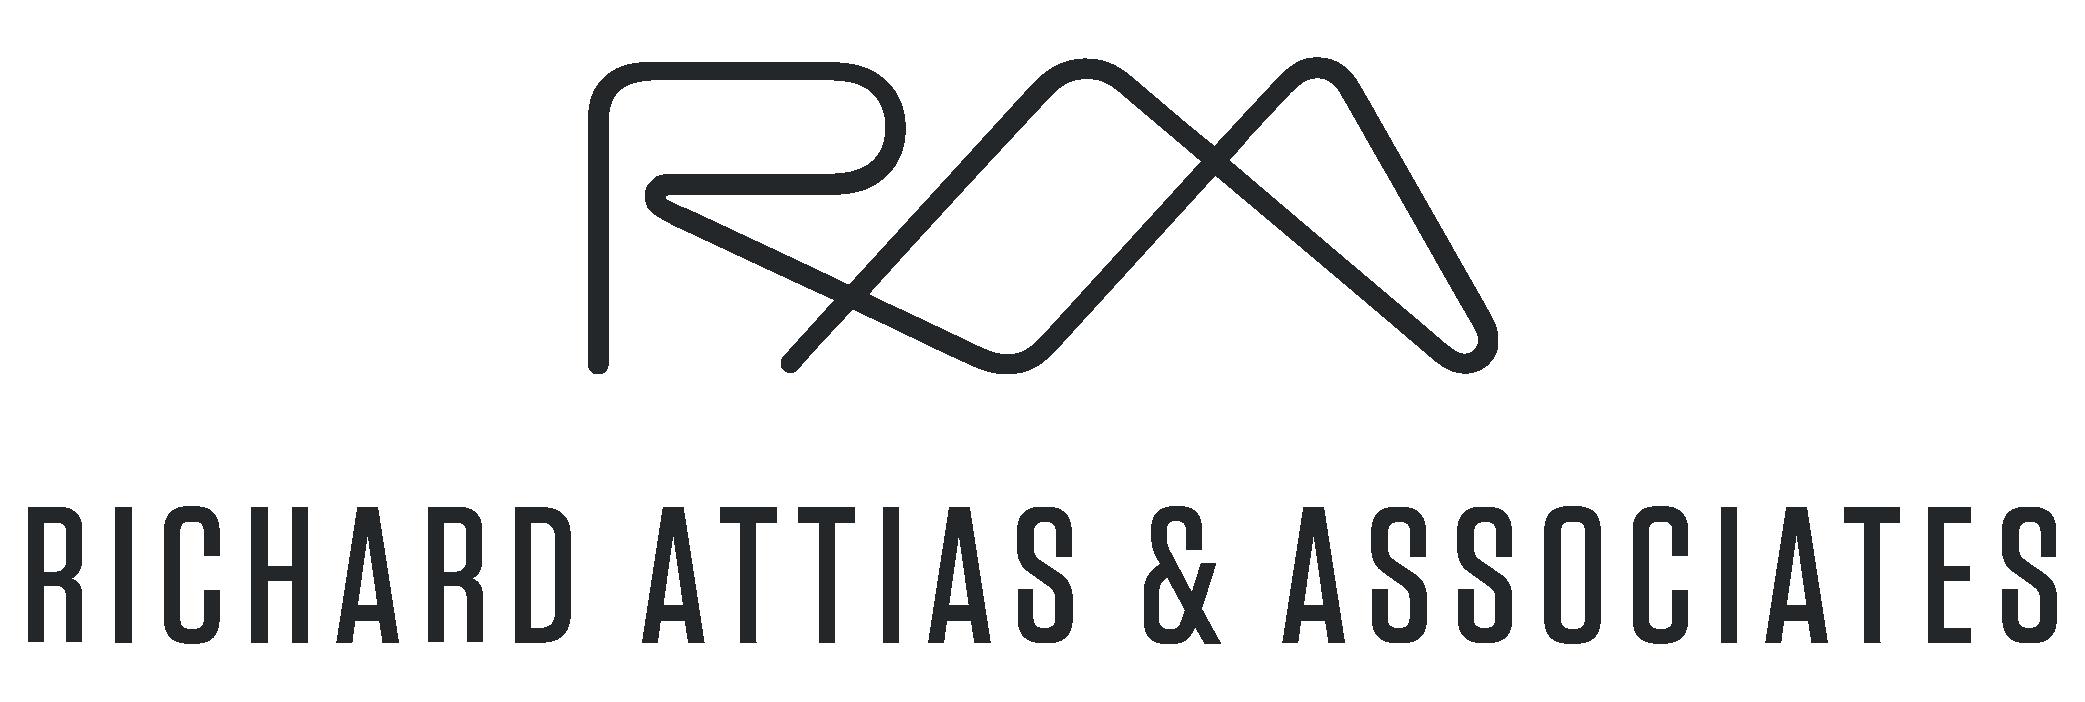 Richard Attias & Associates